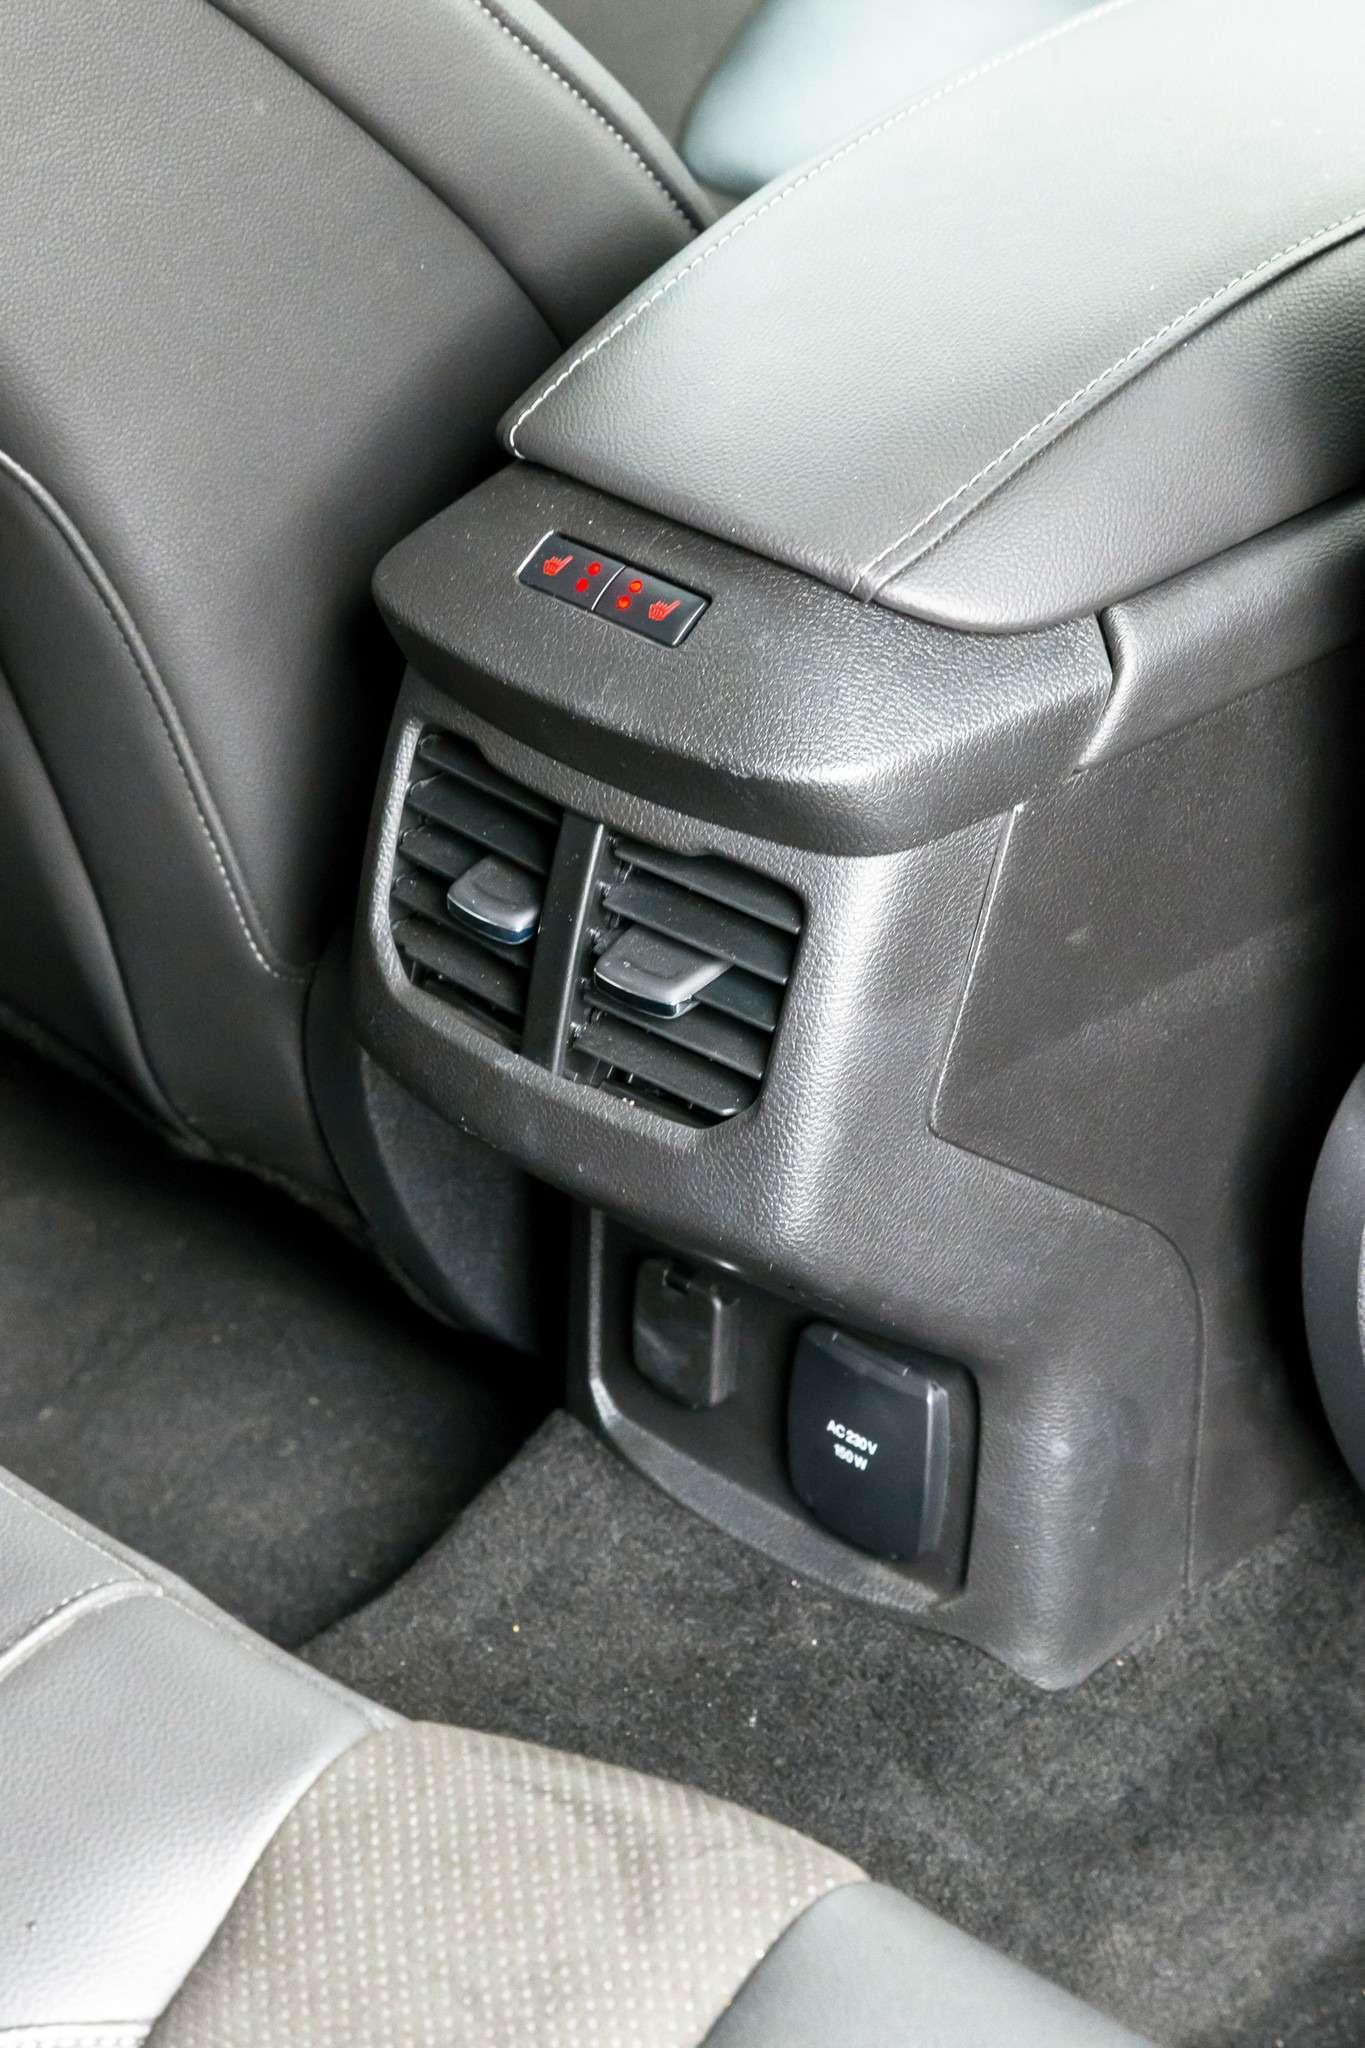 207-Passat_Mondeo_Mazda-6-zr09-15